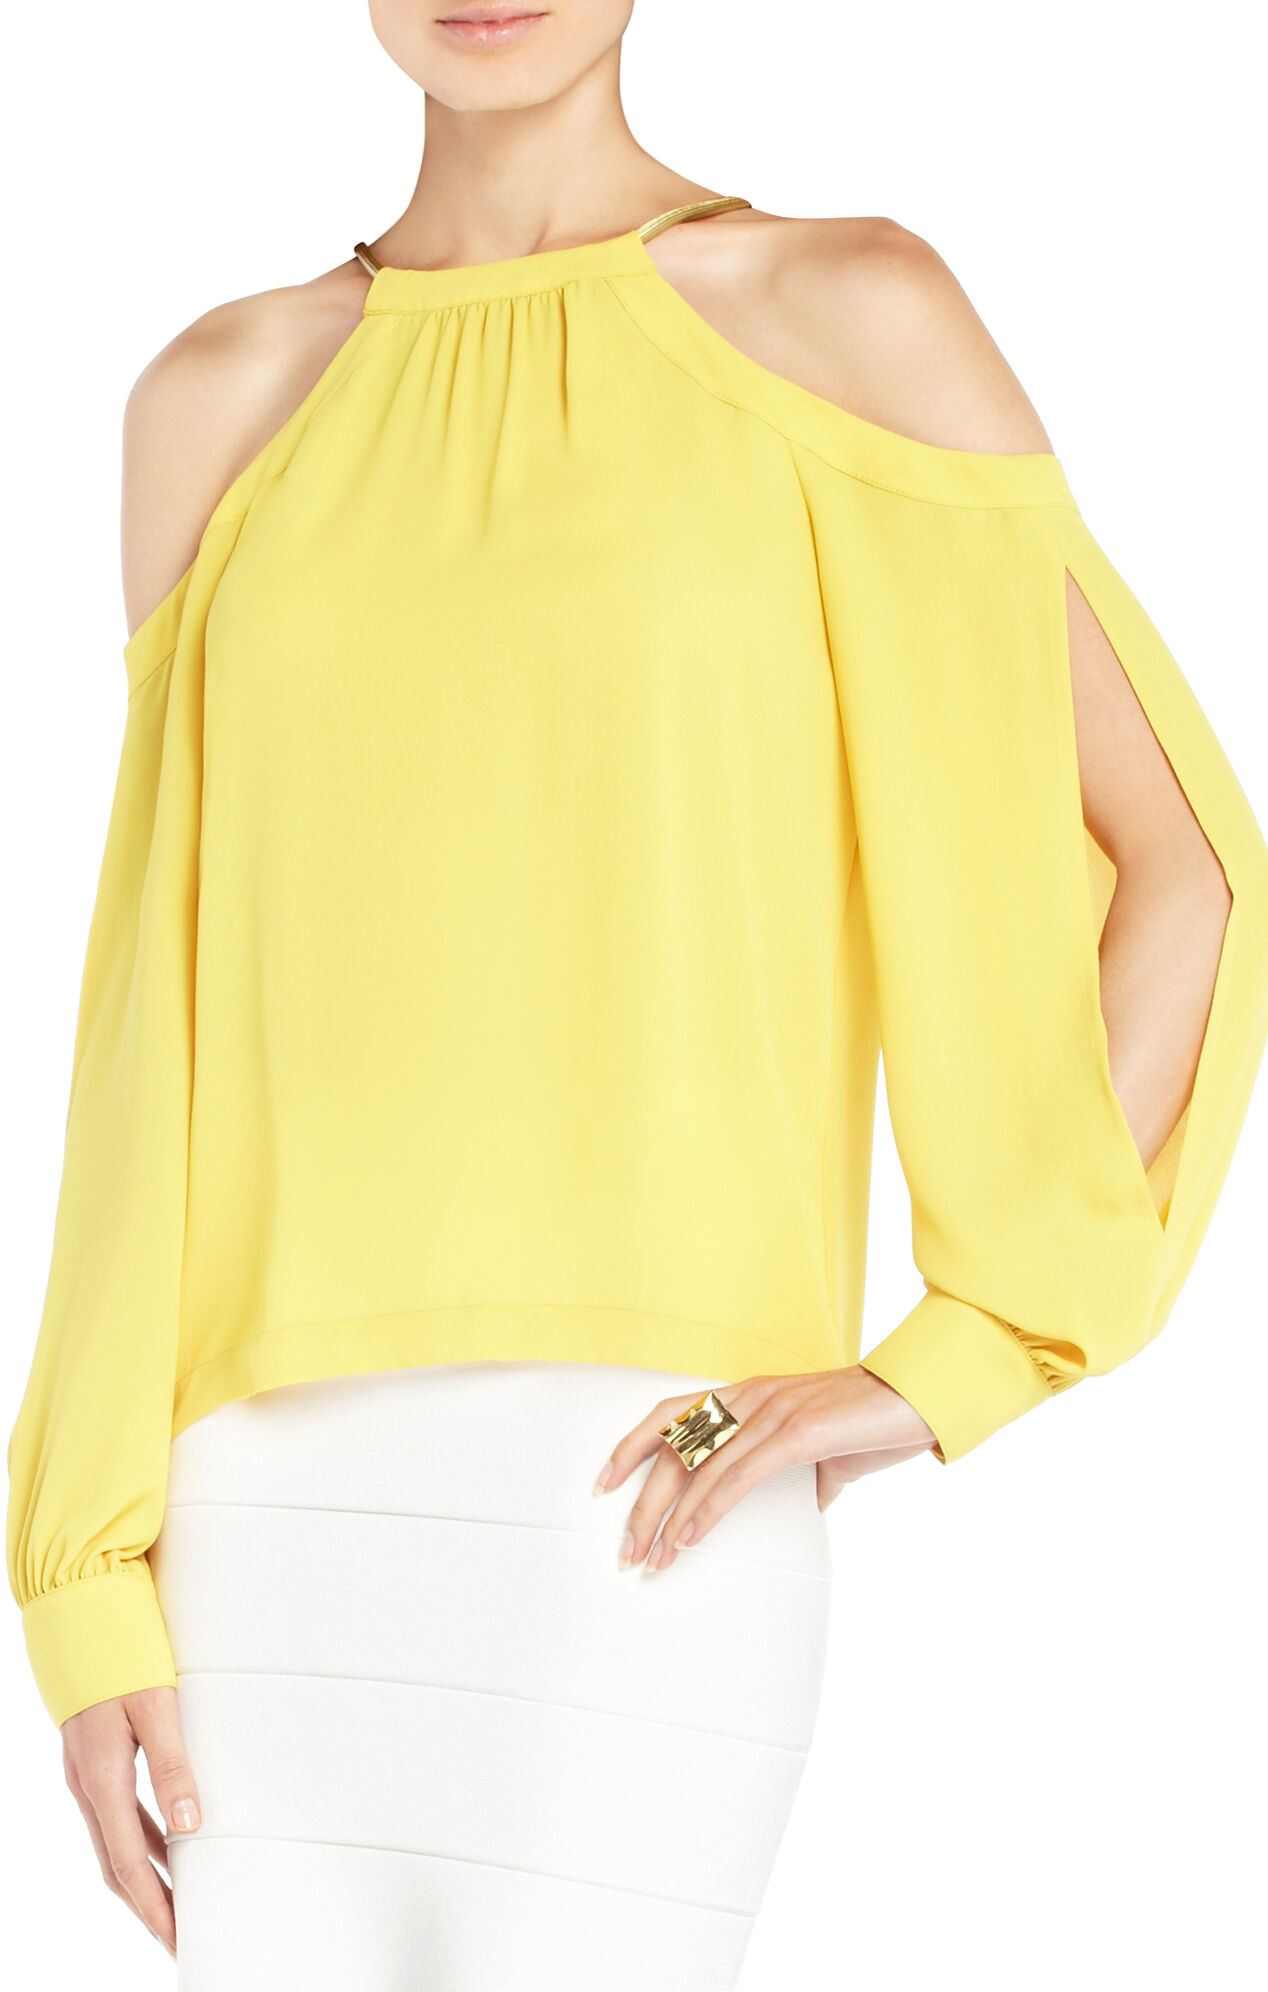 Ivory Open-Shoulder Top